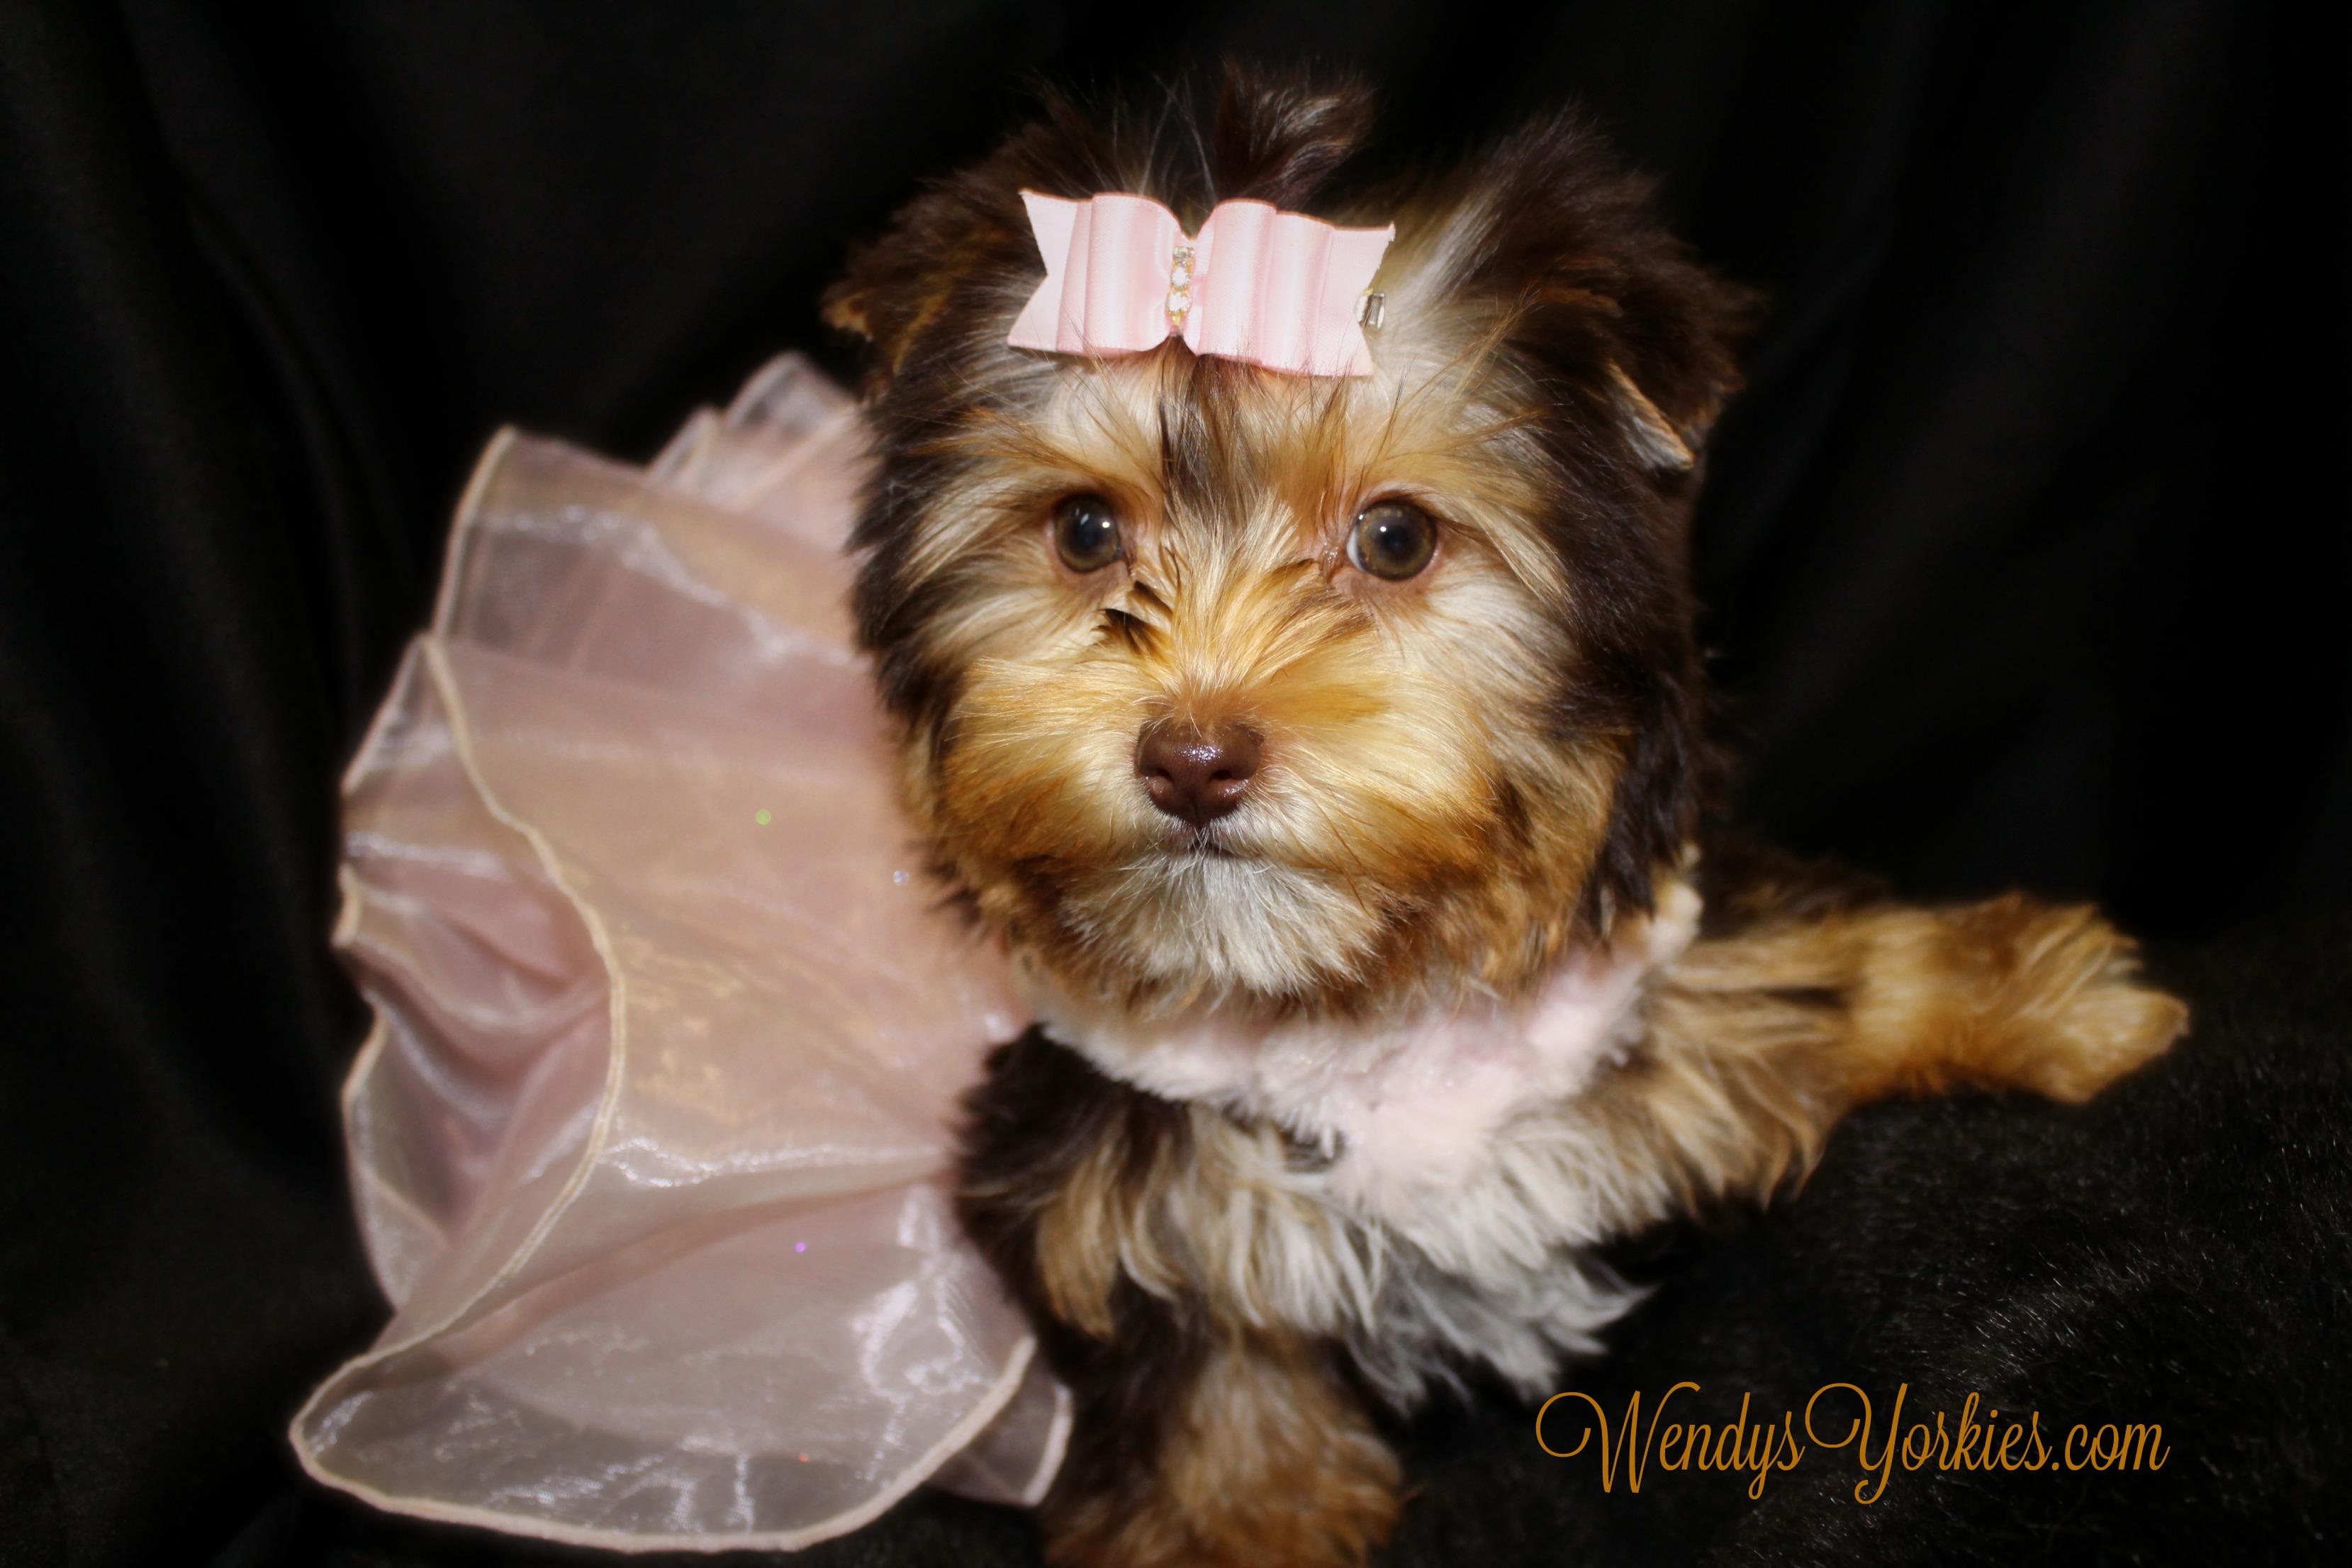 Chocolate Yorkie puppy for sale, WendysYorkies.com, Allie